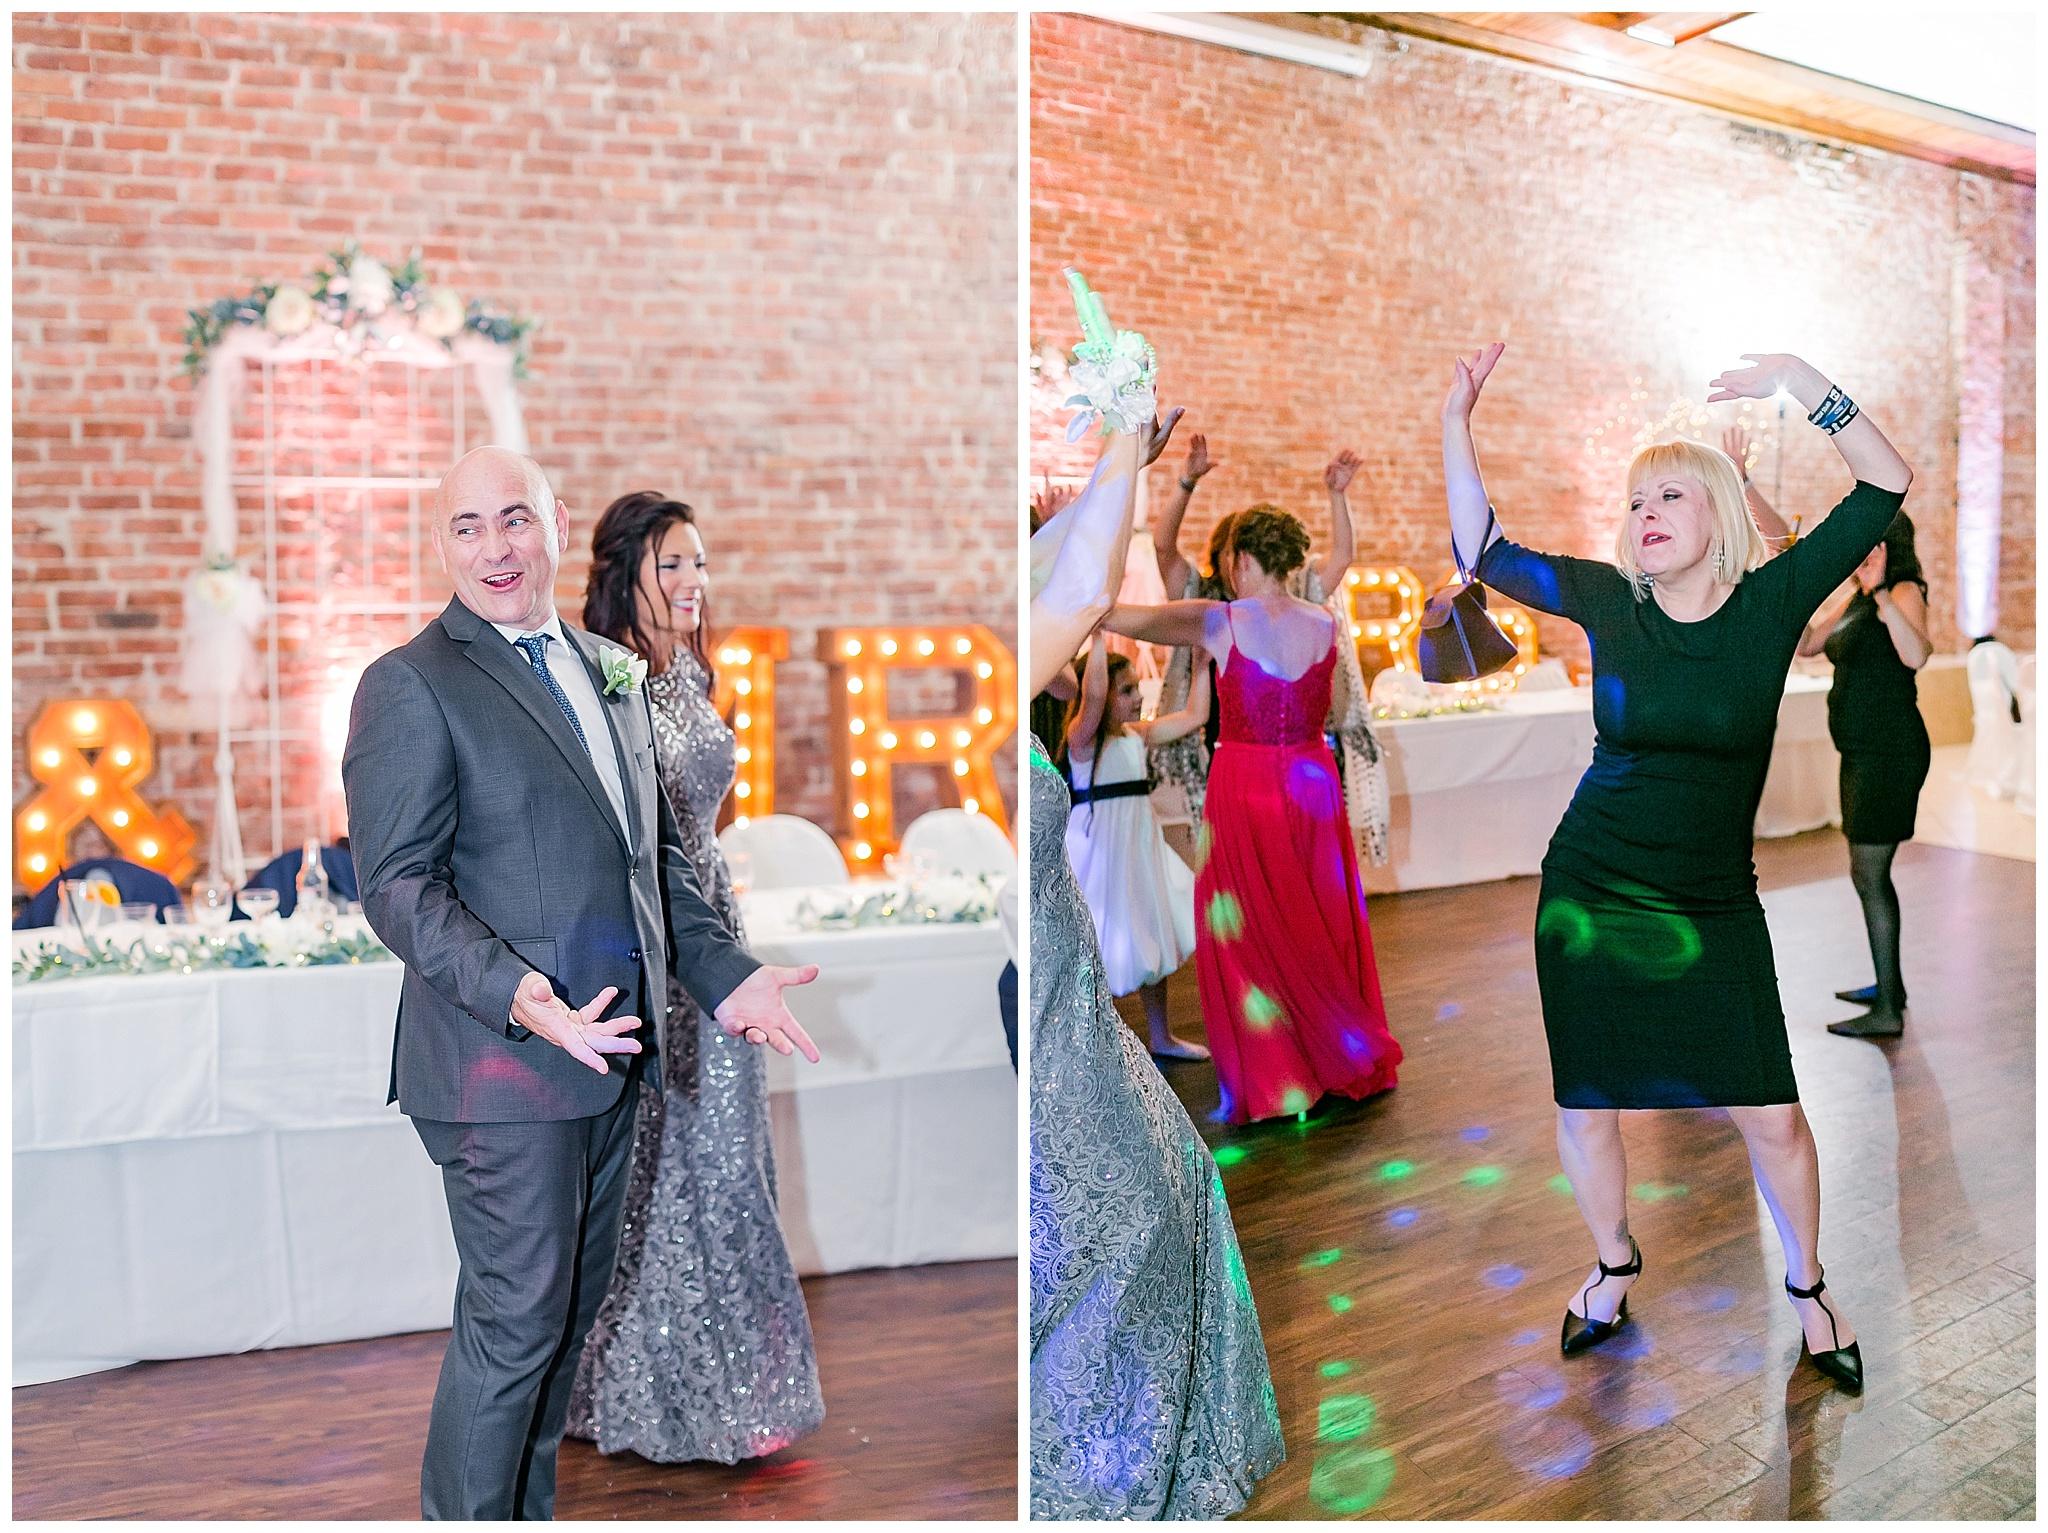 la_casa_grande_wedding_beloit_wisconsin_caynay_photo_0065.jpg